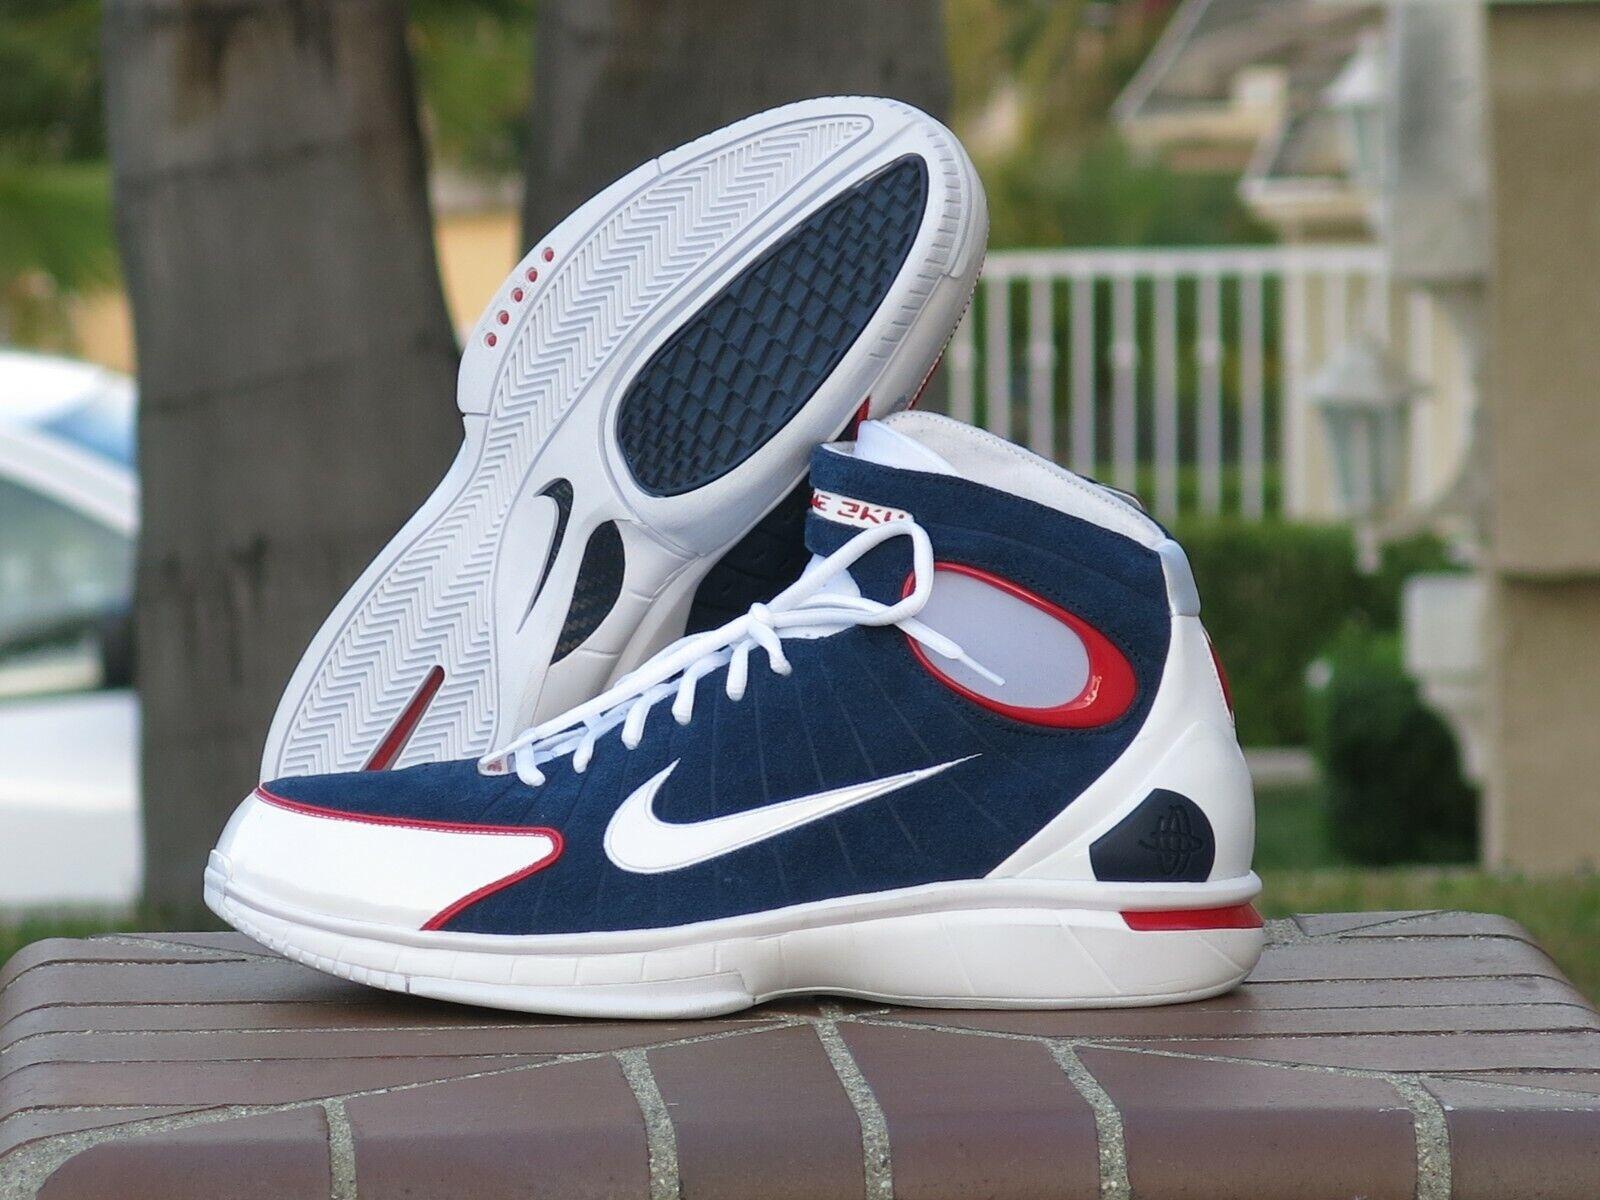 Nike Air Zoom Huarache 2K4 Kobe Men's Basketball Sneakers 308475 400